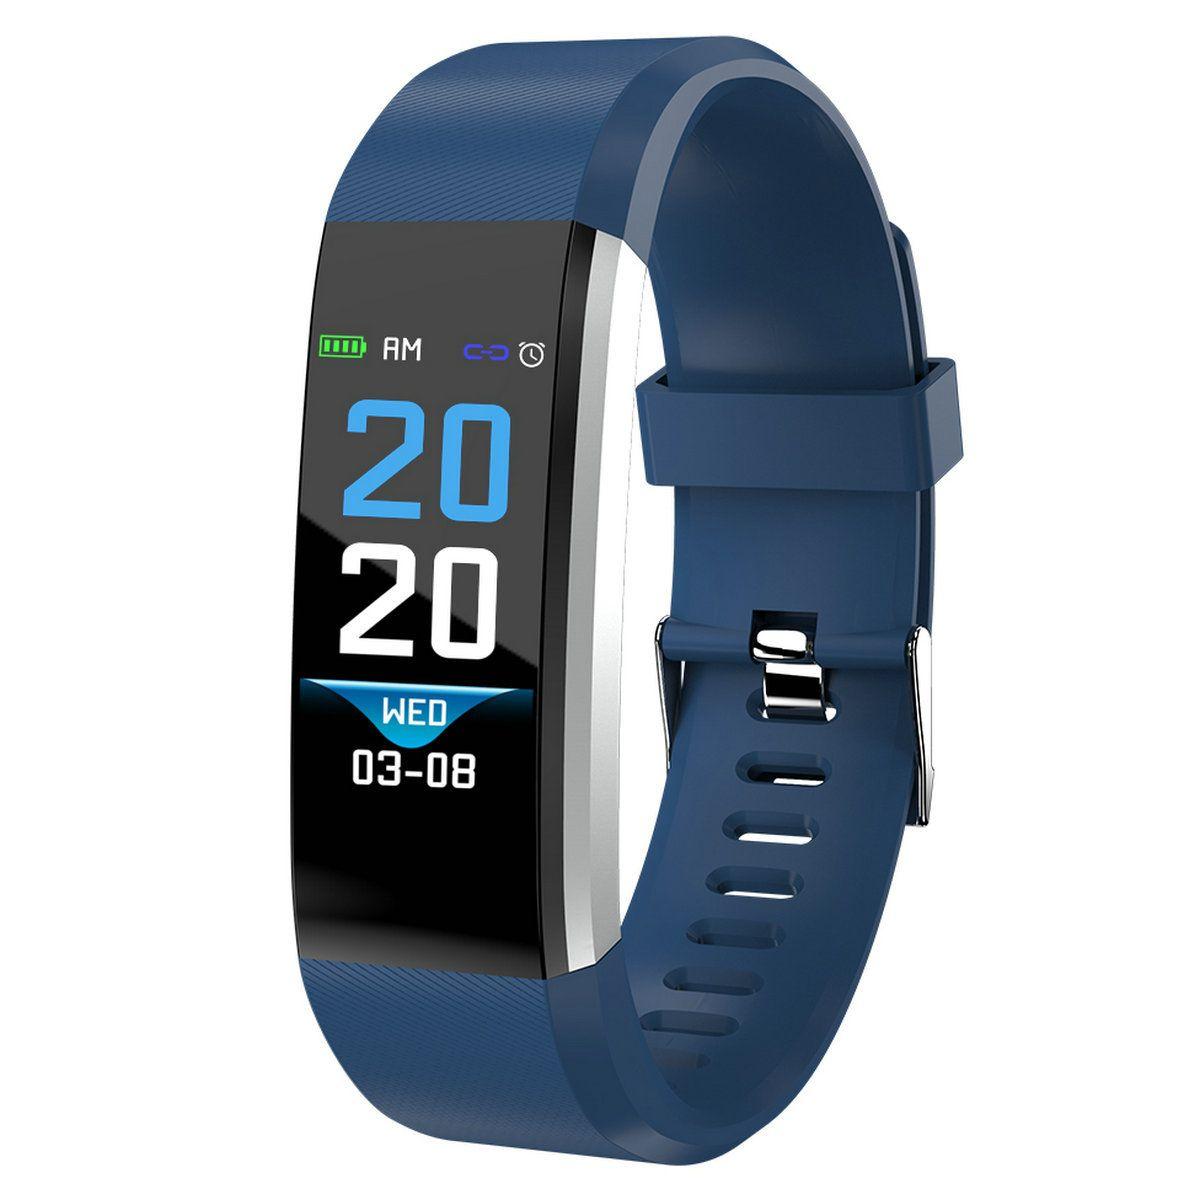 ID115plus الذكية معلومات المتصل سوار تذكير ذكي معدل ضربات القلب الأساور الرياضة Watchbands ماء USB الشحن